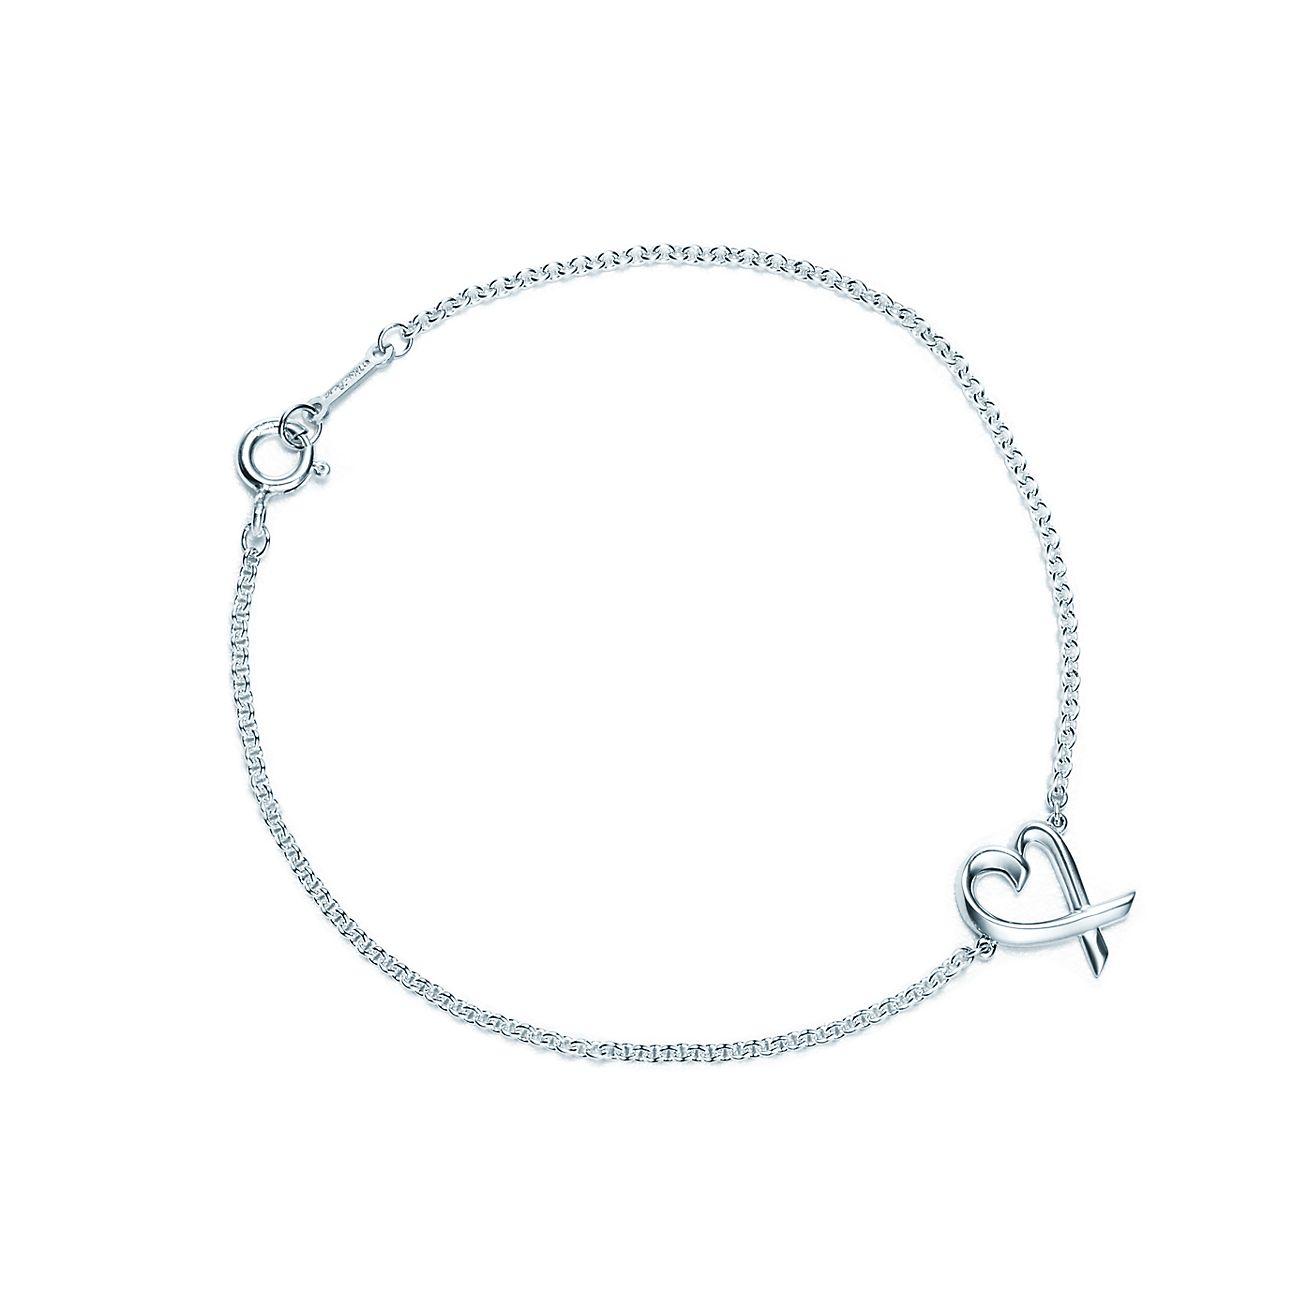 Tiffany Heart Bracelet >> Paloma Picasso Loving Heart Bracelet In Sterling Silver Medium